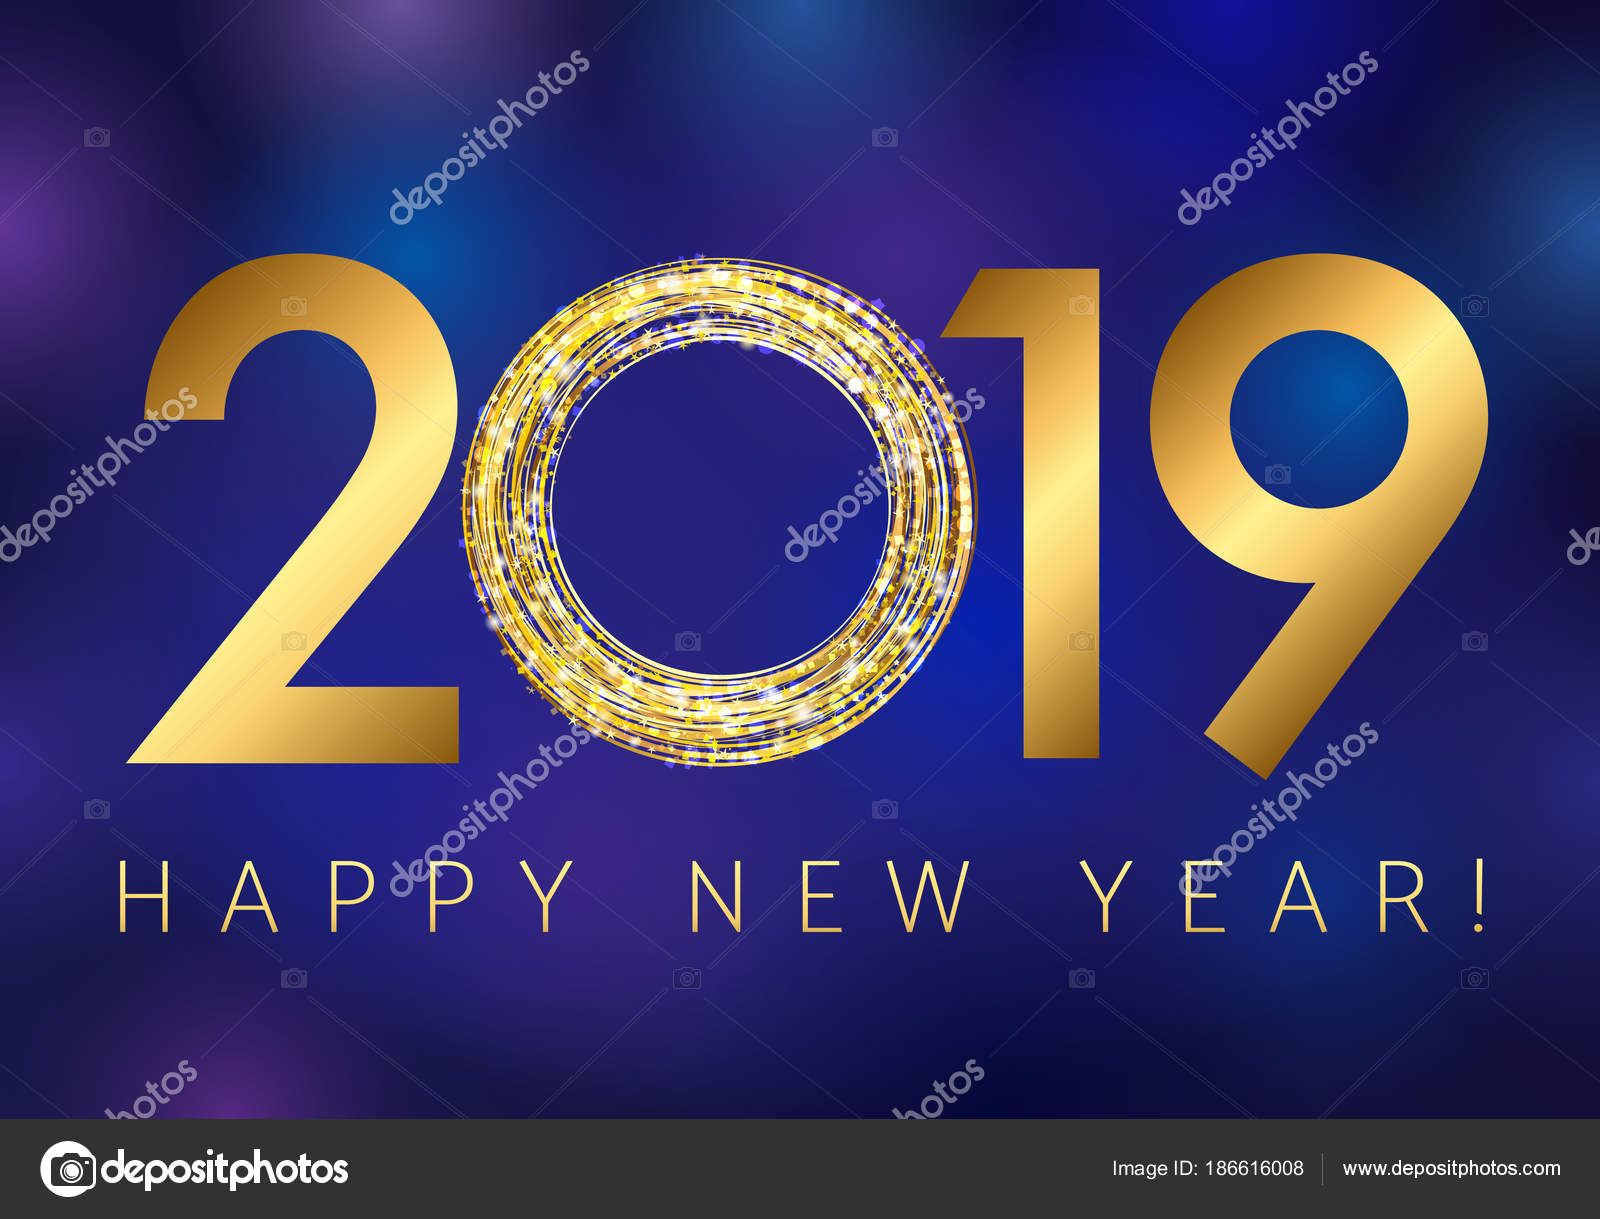 2019 happy new year greetings dark blue background golden glitter 2019 happy new year greetings dark blue background golden glitter stock vector kristyandbryce Gallery